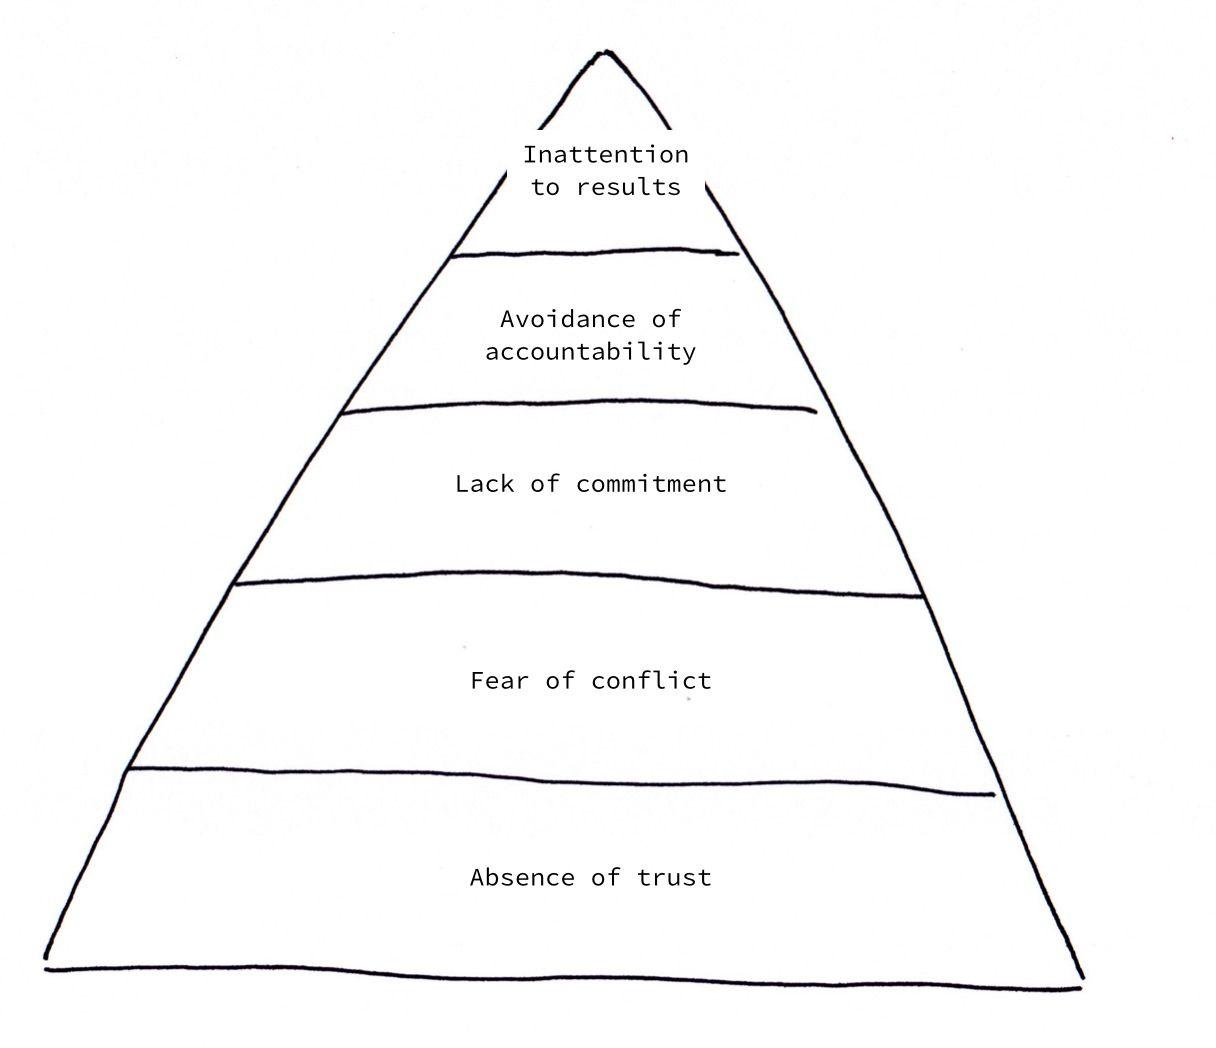 Five Dysfunctions Of A Team Ulf Schneider